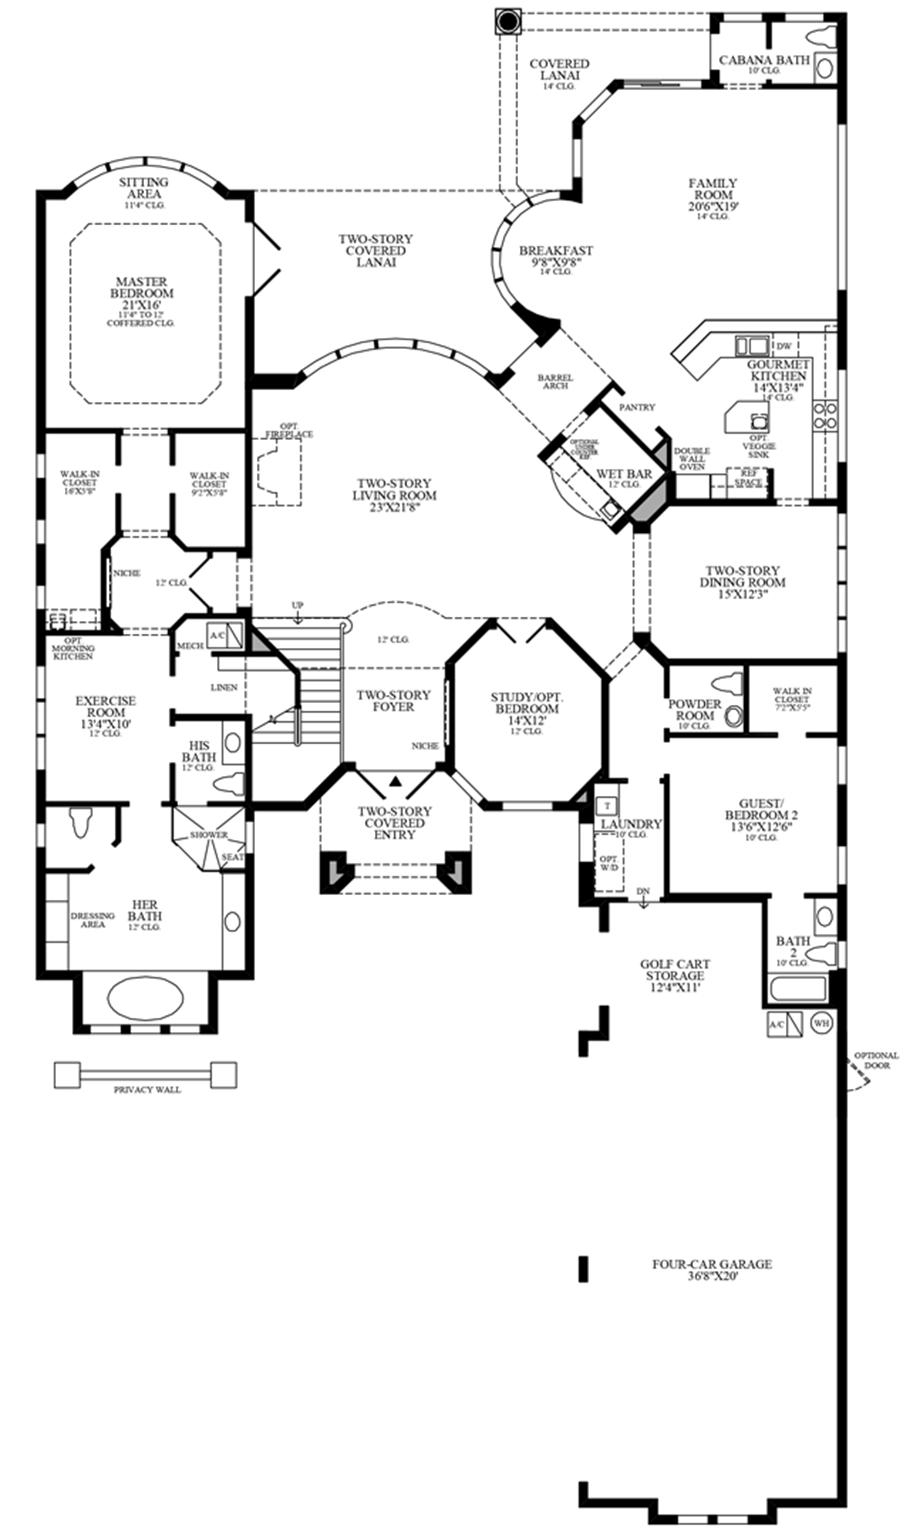 Optional 3-Car Garage Floor Plan